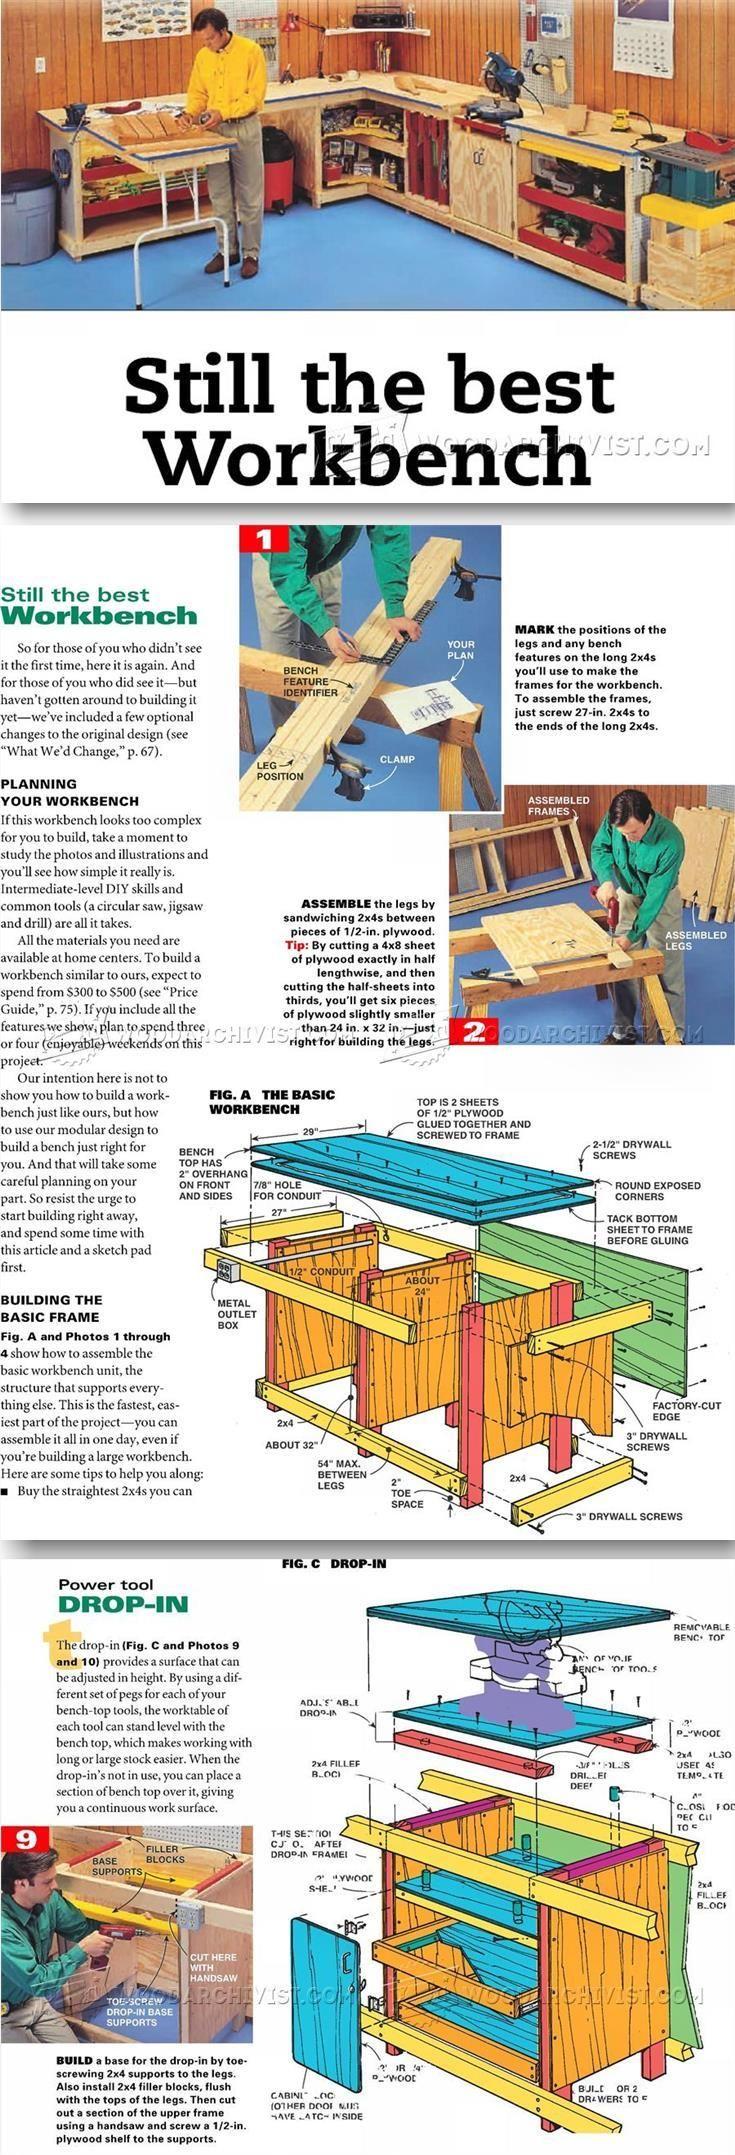 Workstation Plans - Workshop Solutions Plans, Tips and Tricks | WoodArchivist.com